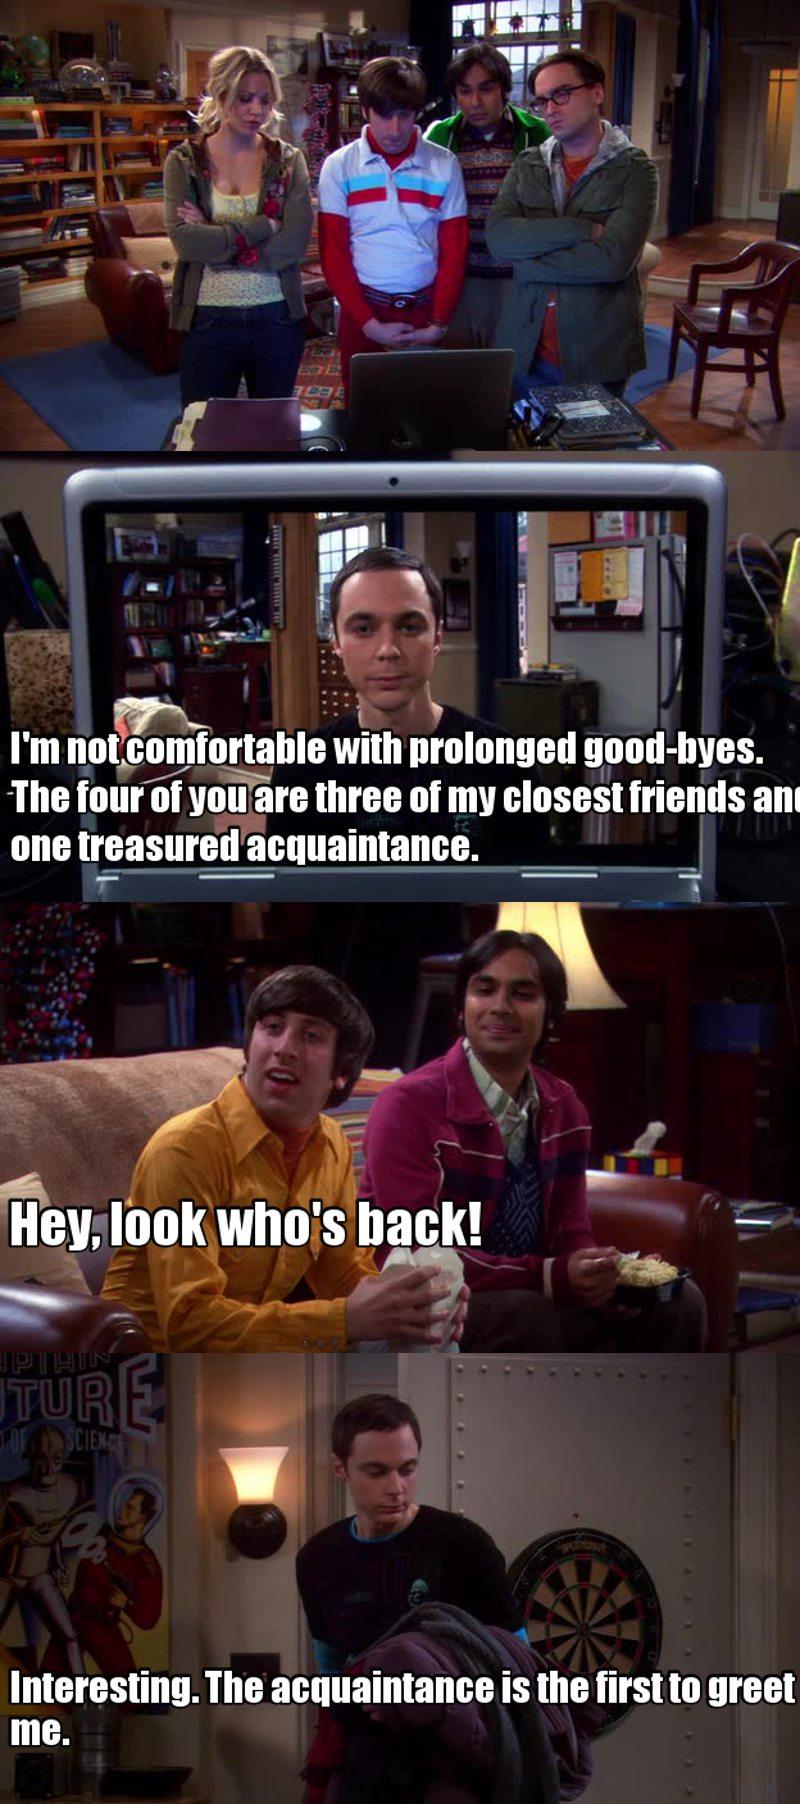 Howard... Sheldon's treasured acquaintance.